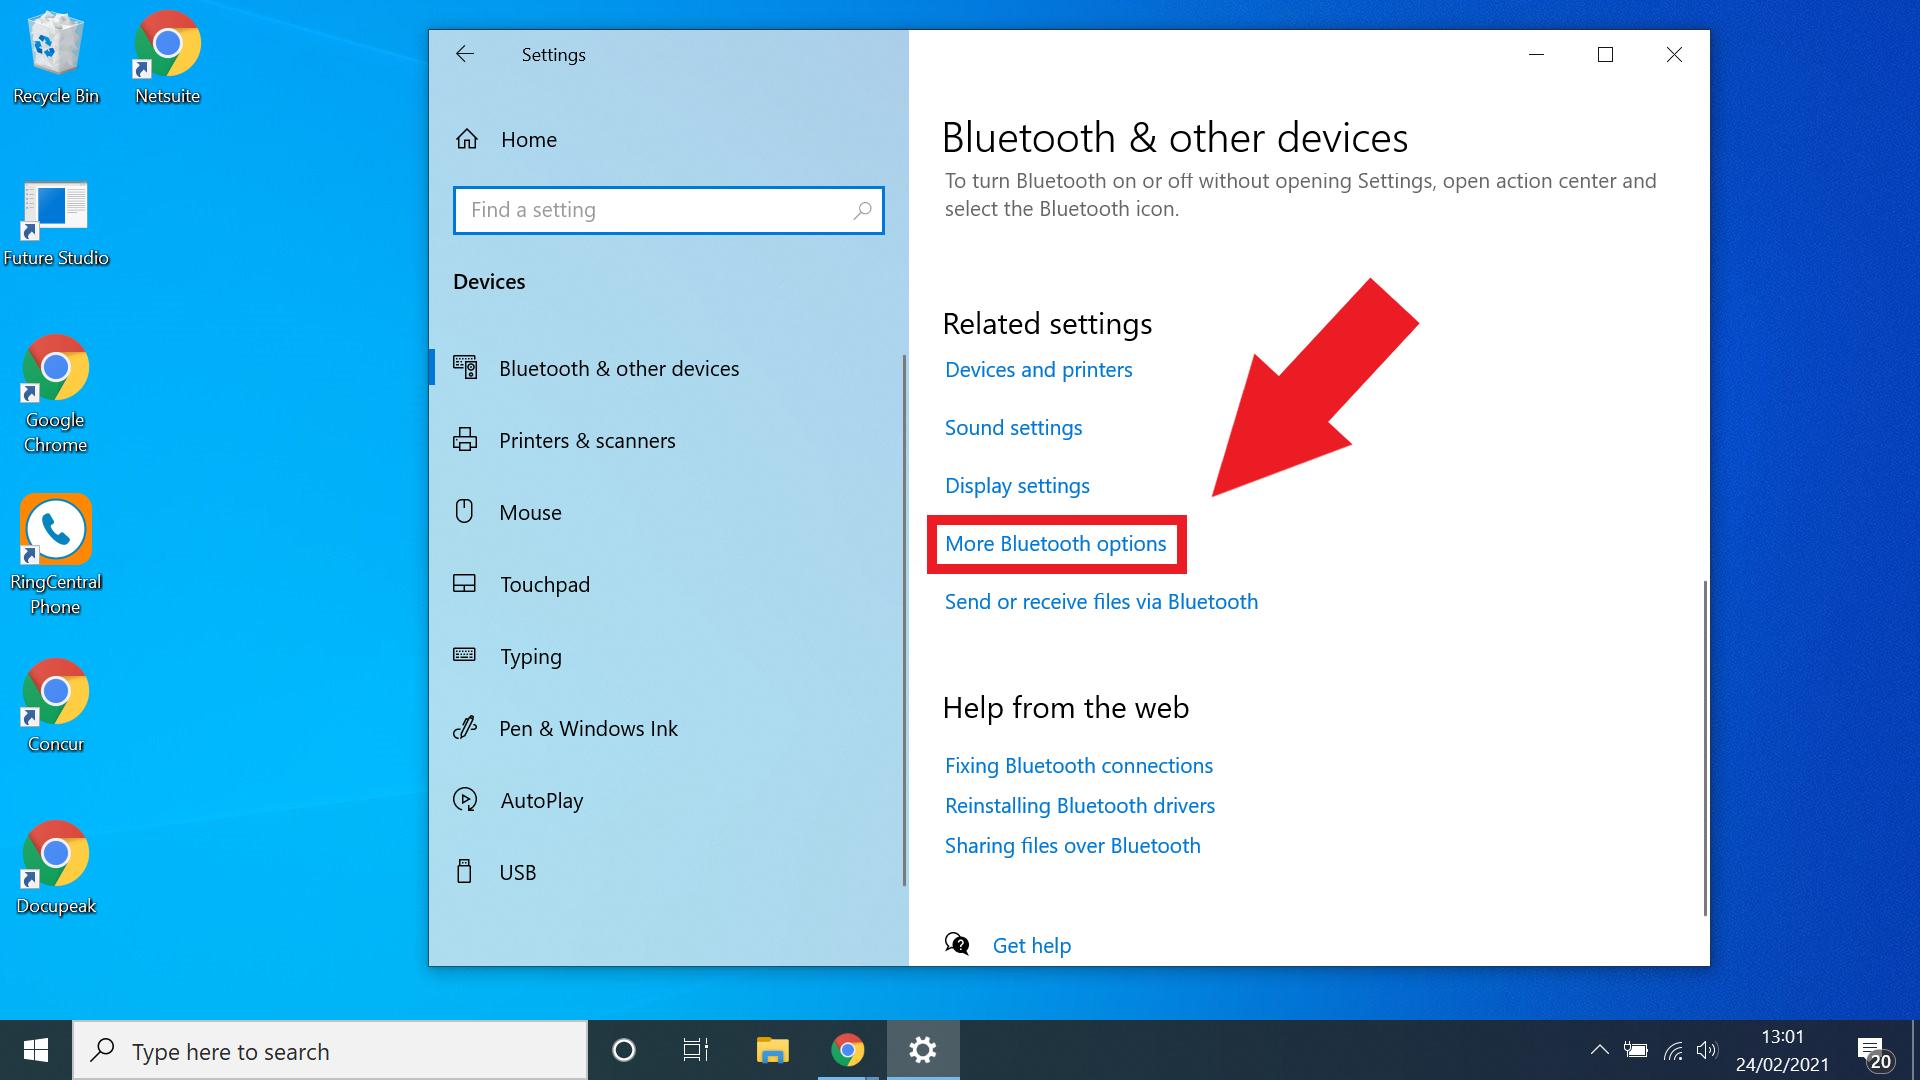 cara mengaktifkan bluetooth untuk windows 10 - pilih lebih banyak opsi bluetooth jika diperlukan